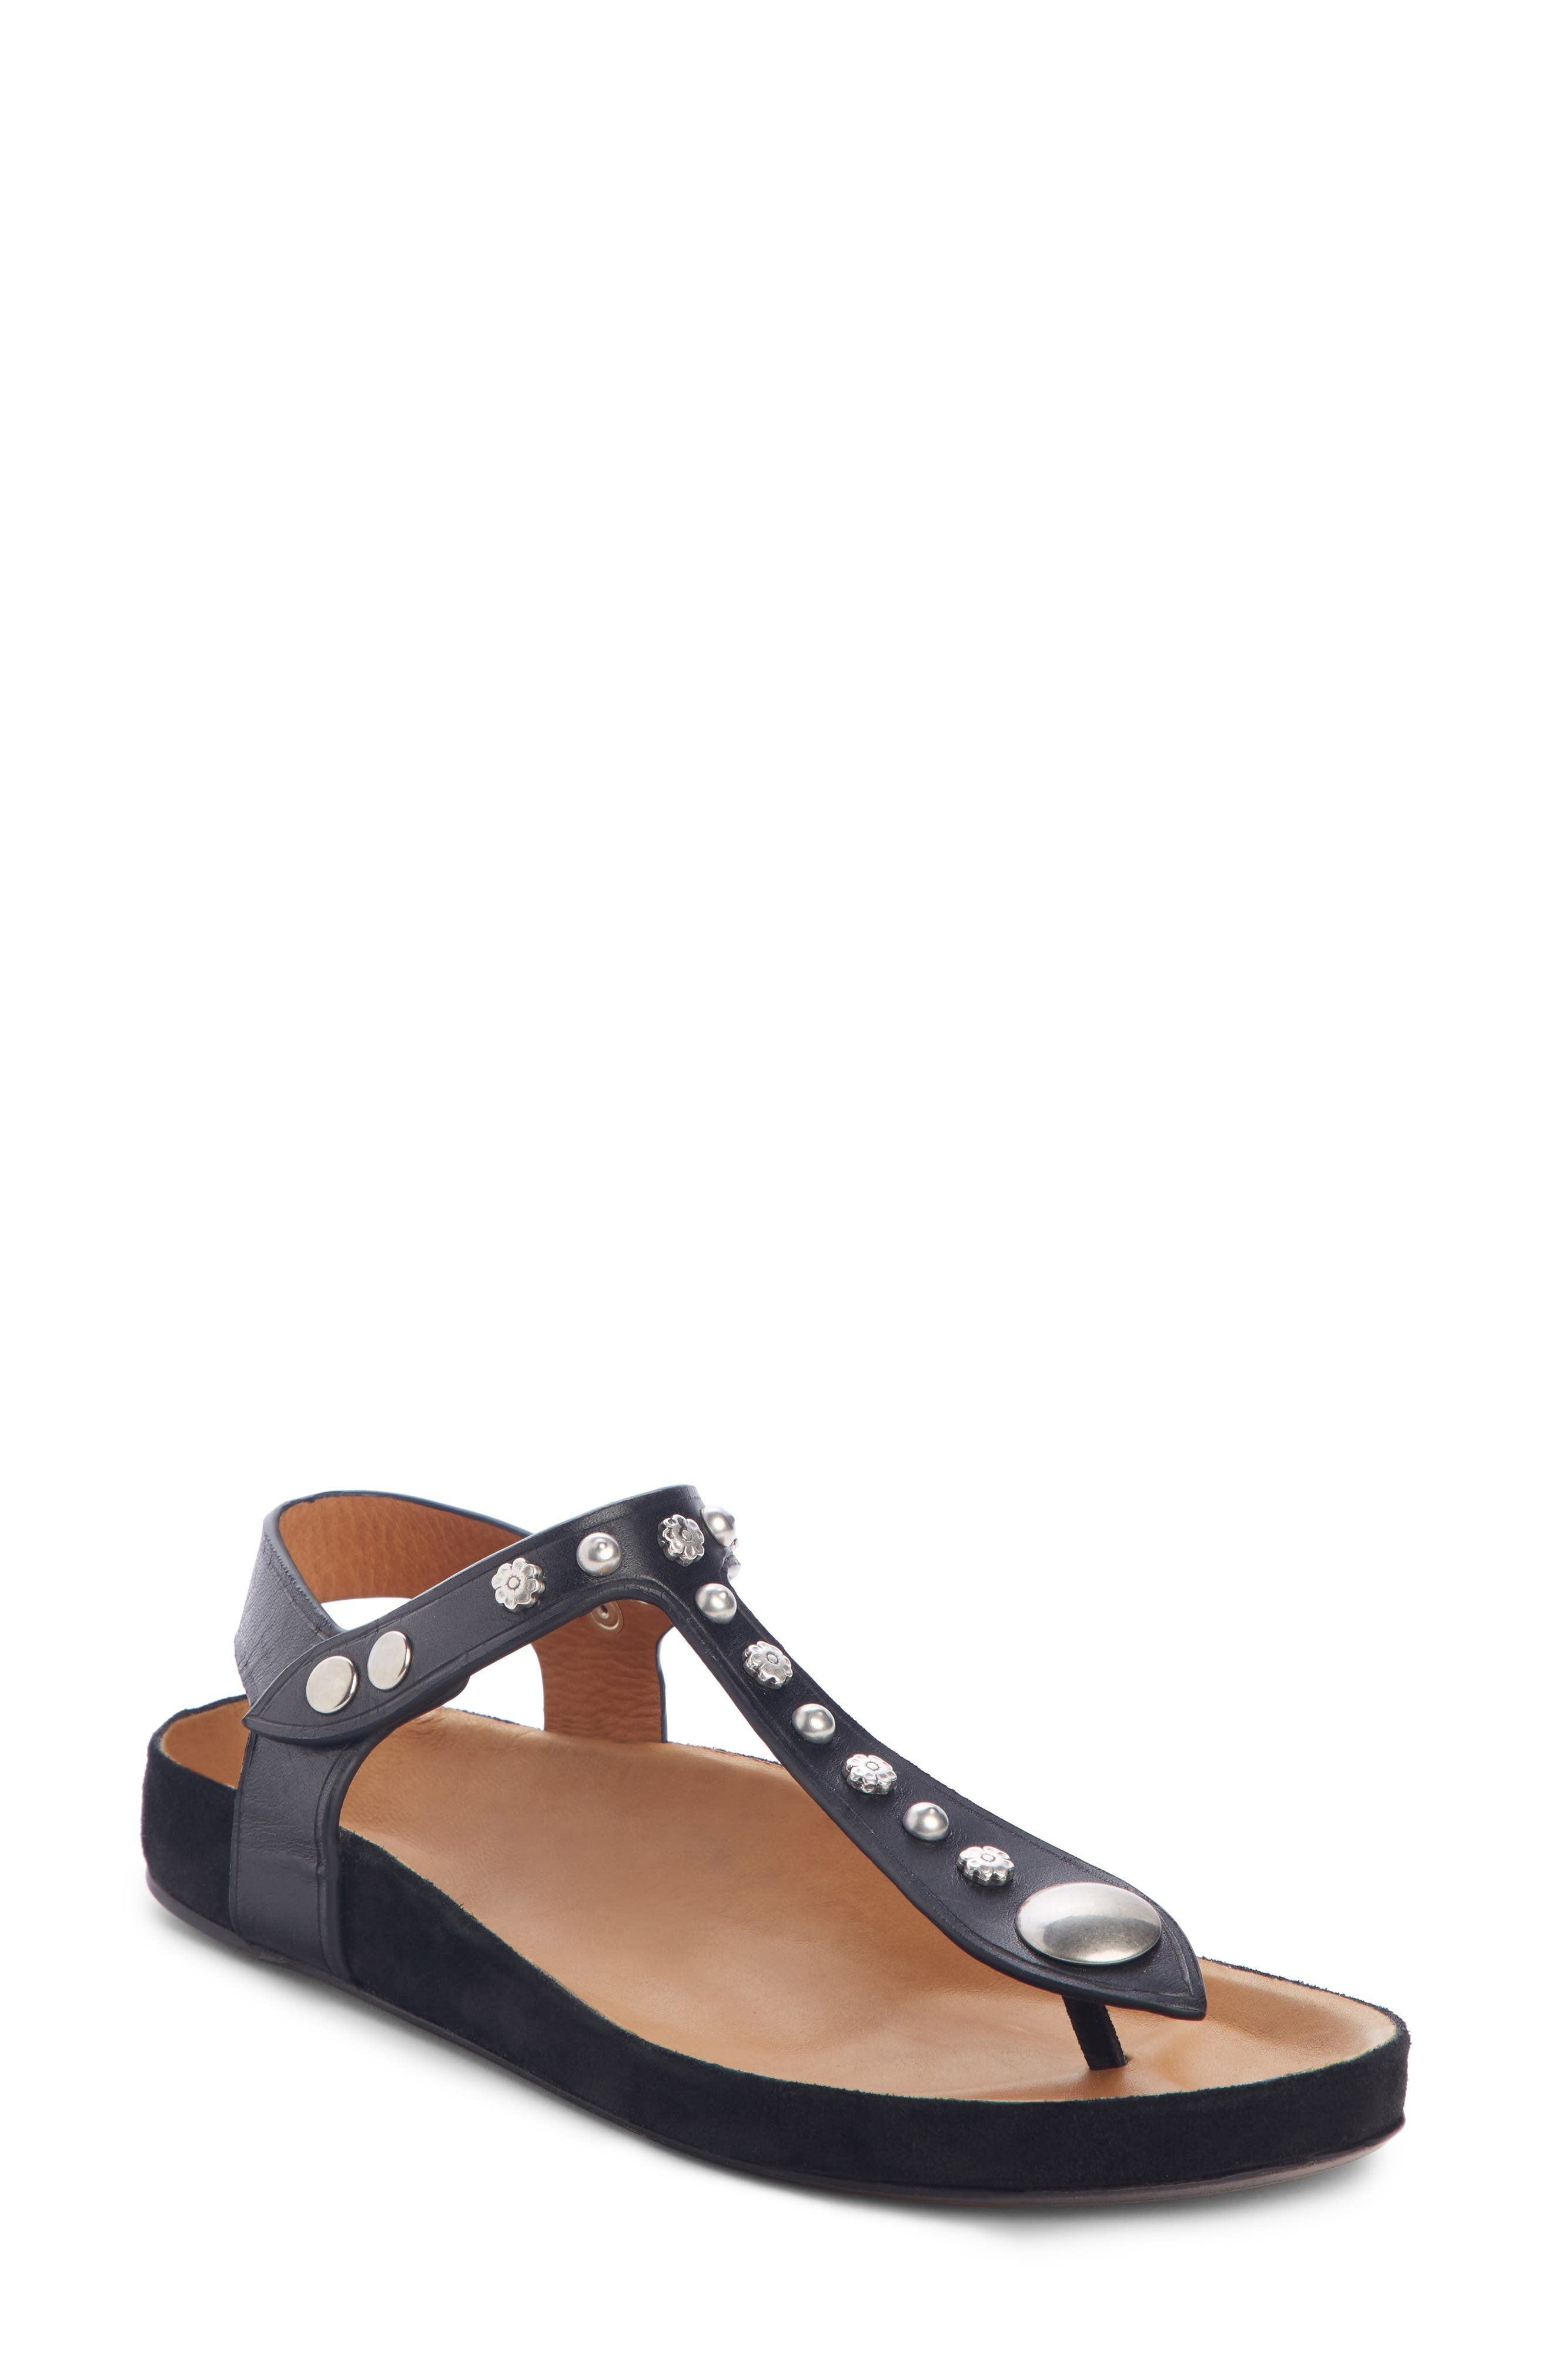 Enore Studded Sandal, Main, color, BLACK